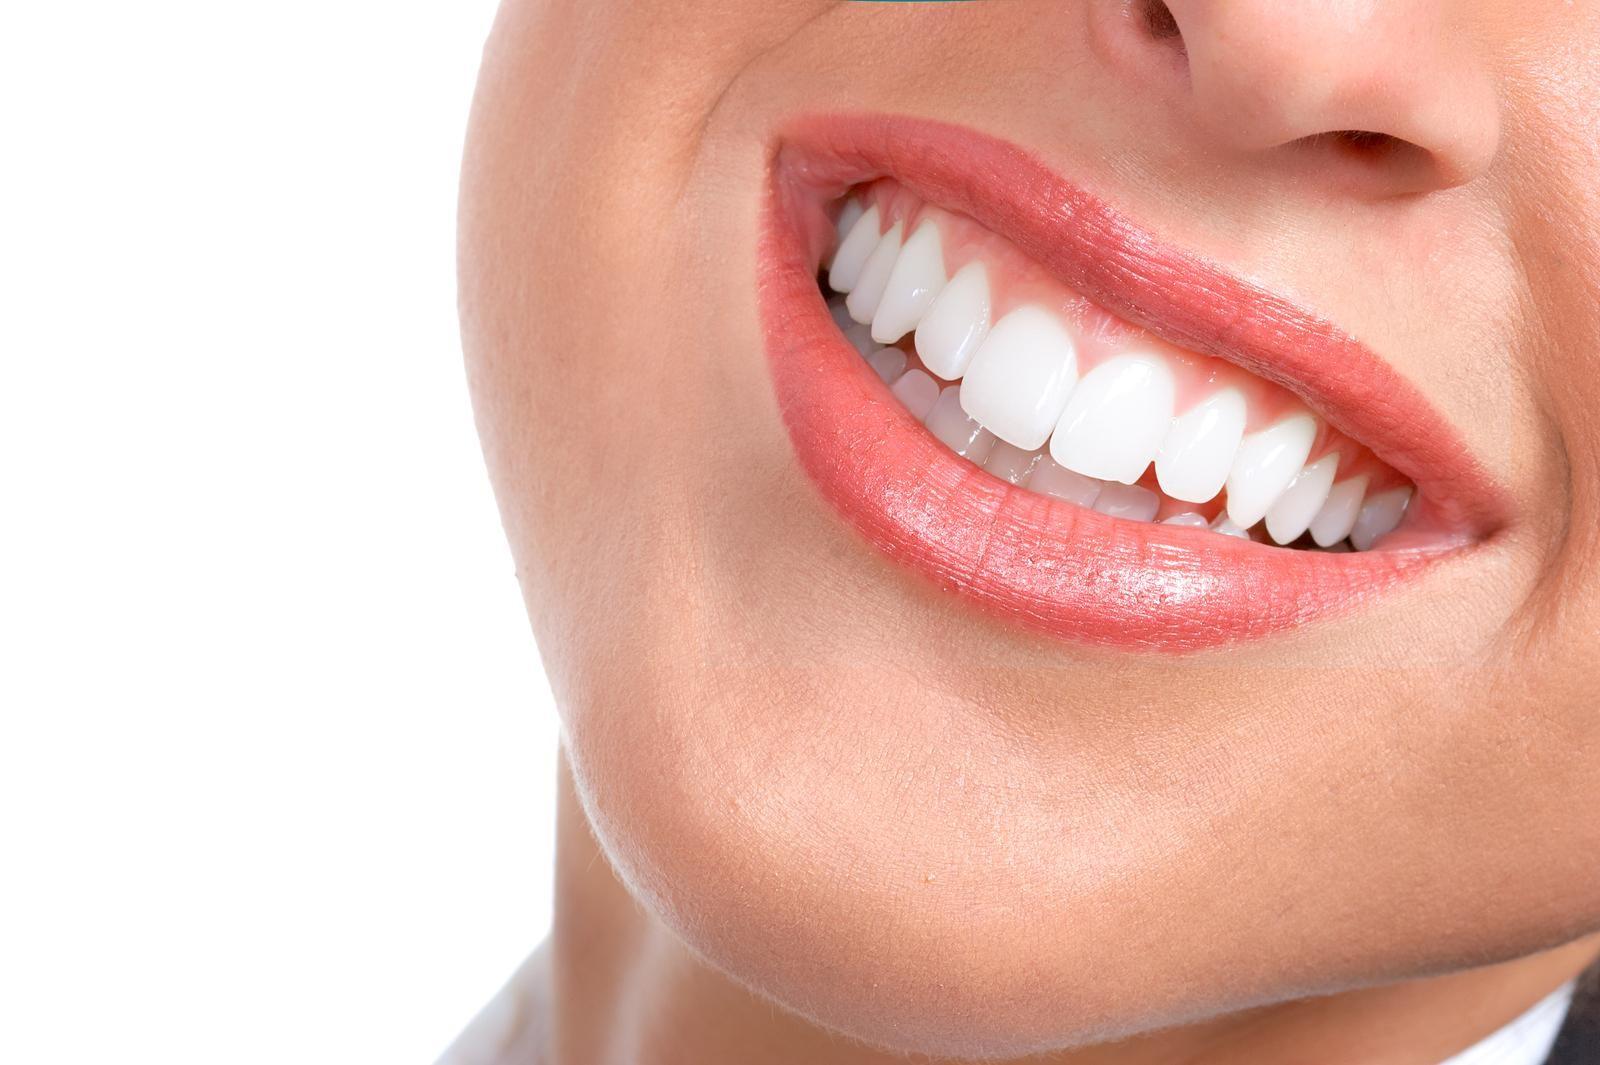 Atlanta Dentistry Provides Invisalign as Alternative to